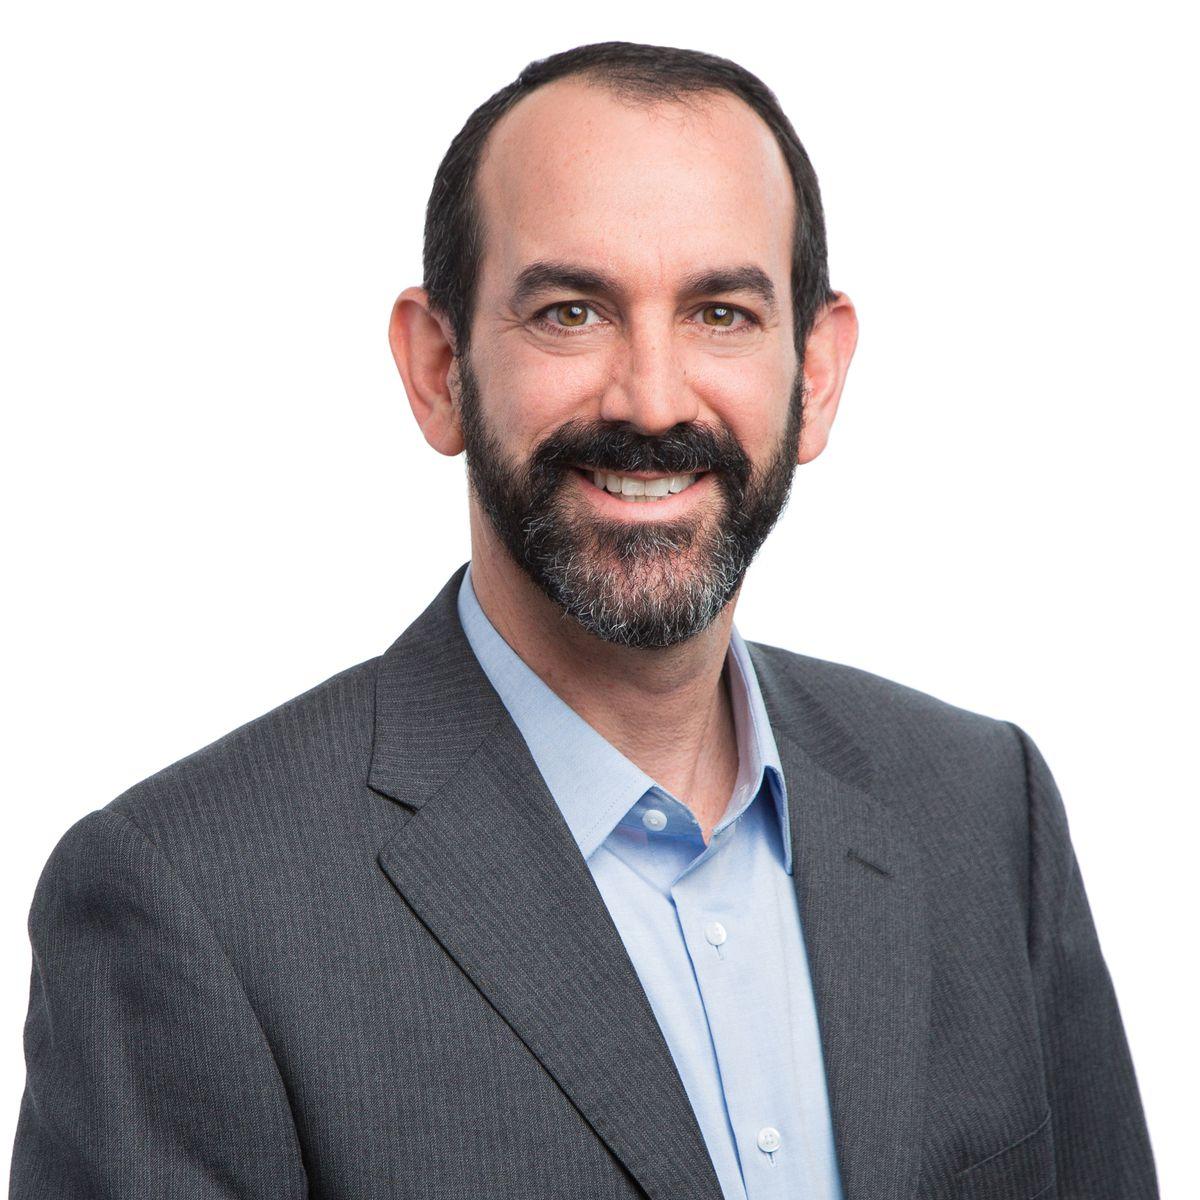 Reid Cramer